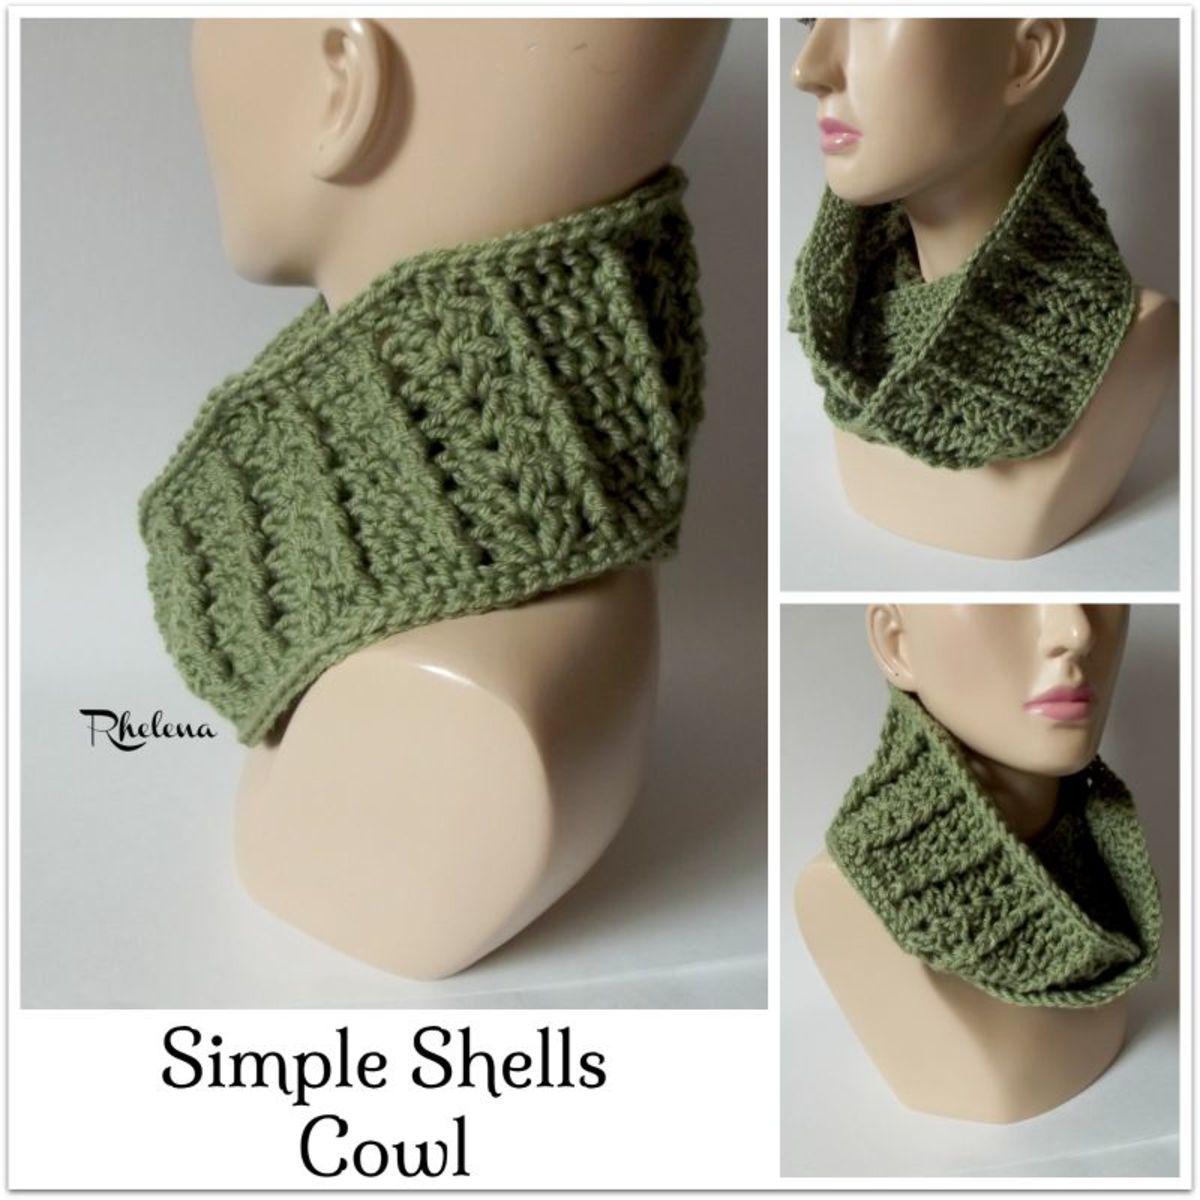 Crocheting Benefits : FREE Cowl Crochet Pattern: http://crochetncrafts.com/simple-shells ...